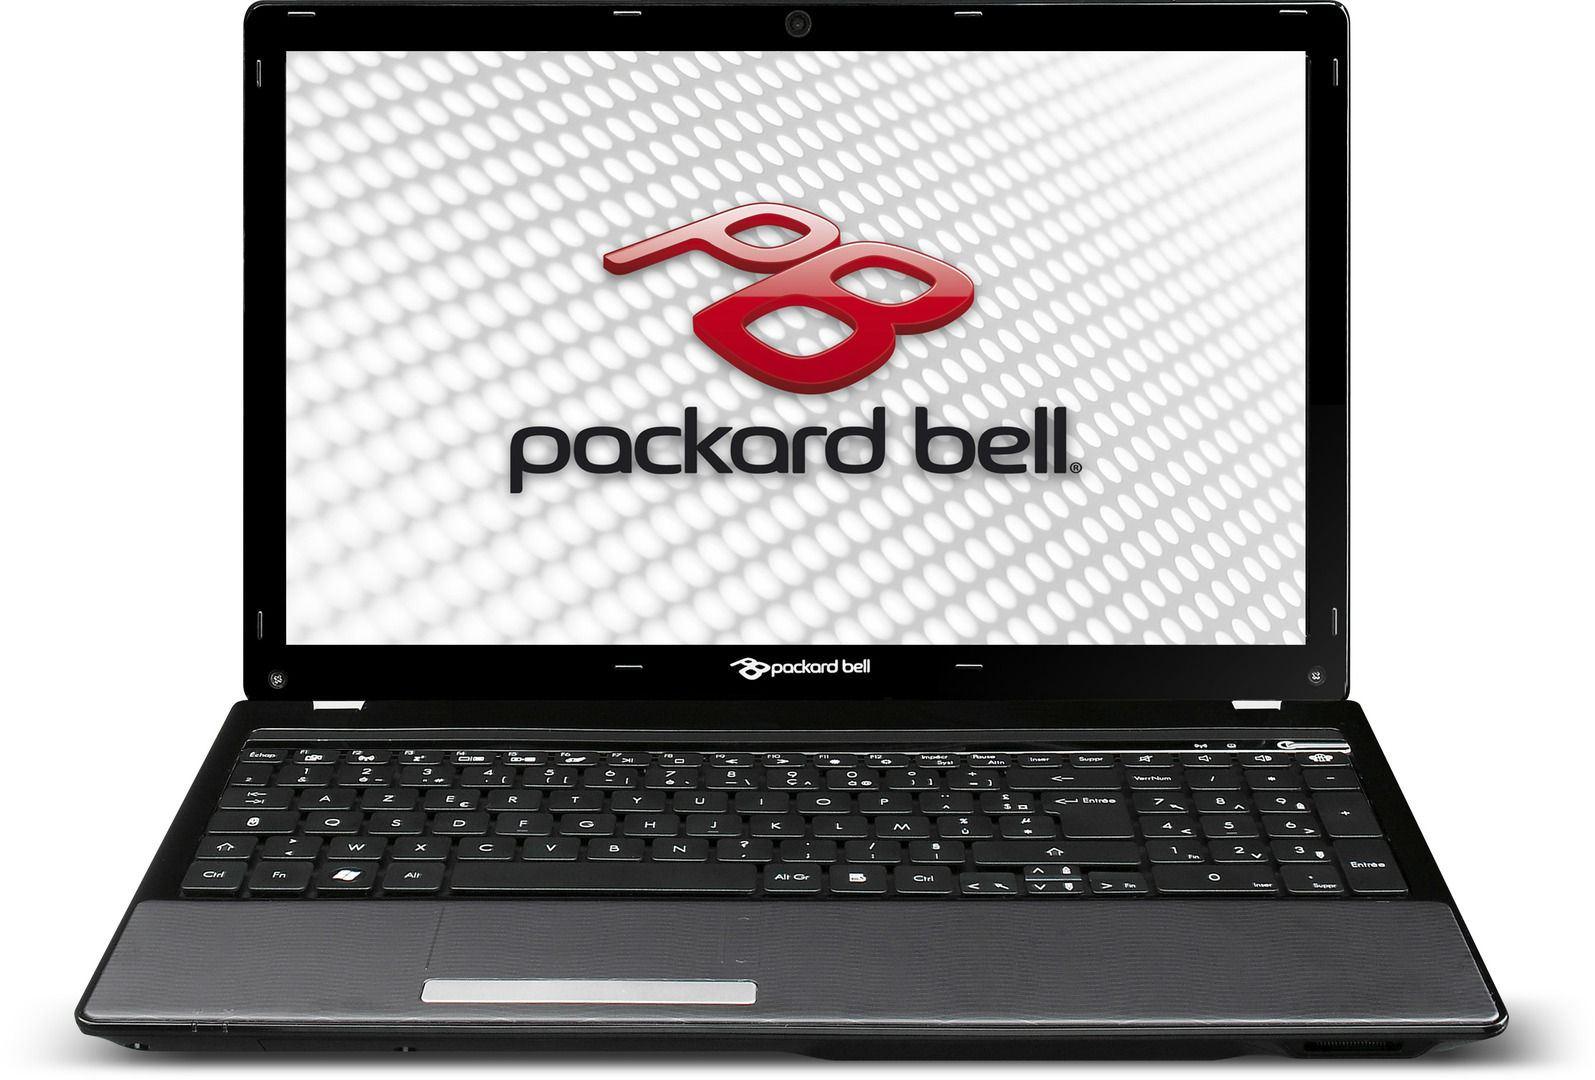 Packard Bell EasyNote TM – 2762